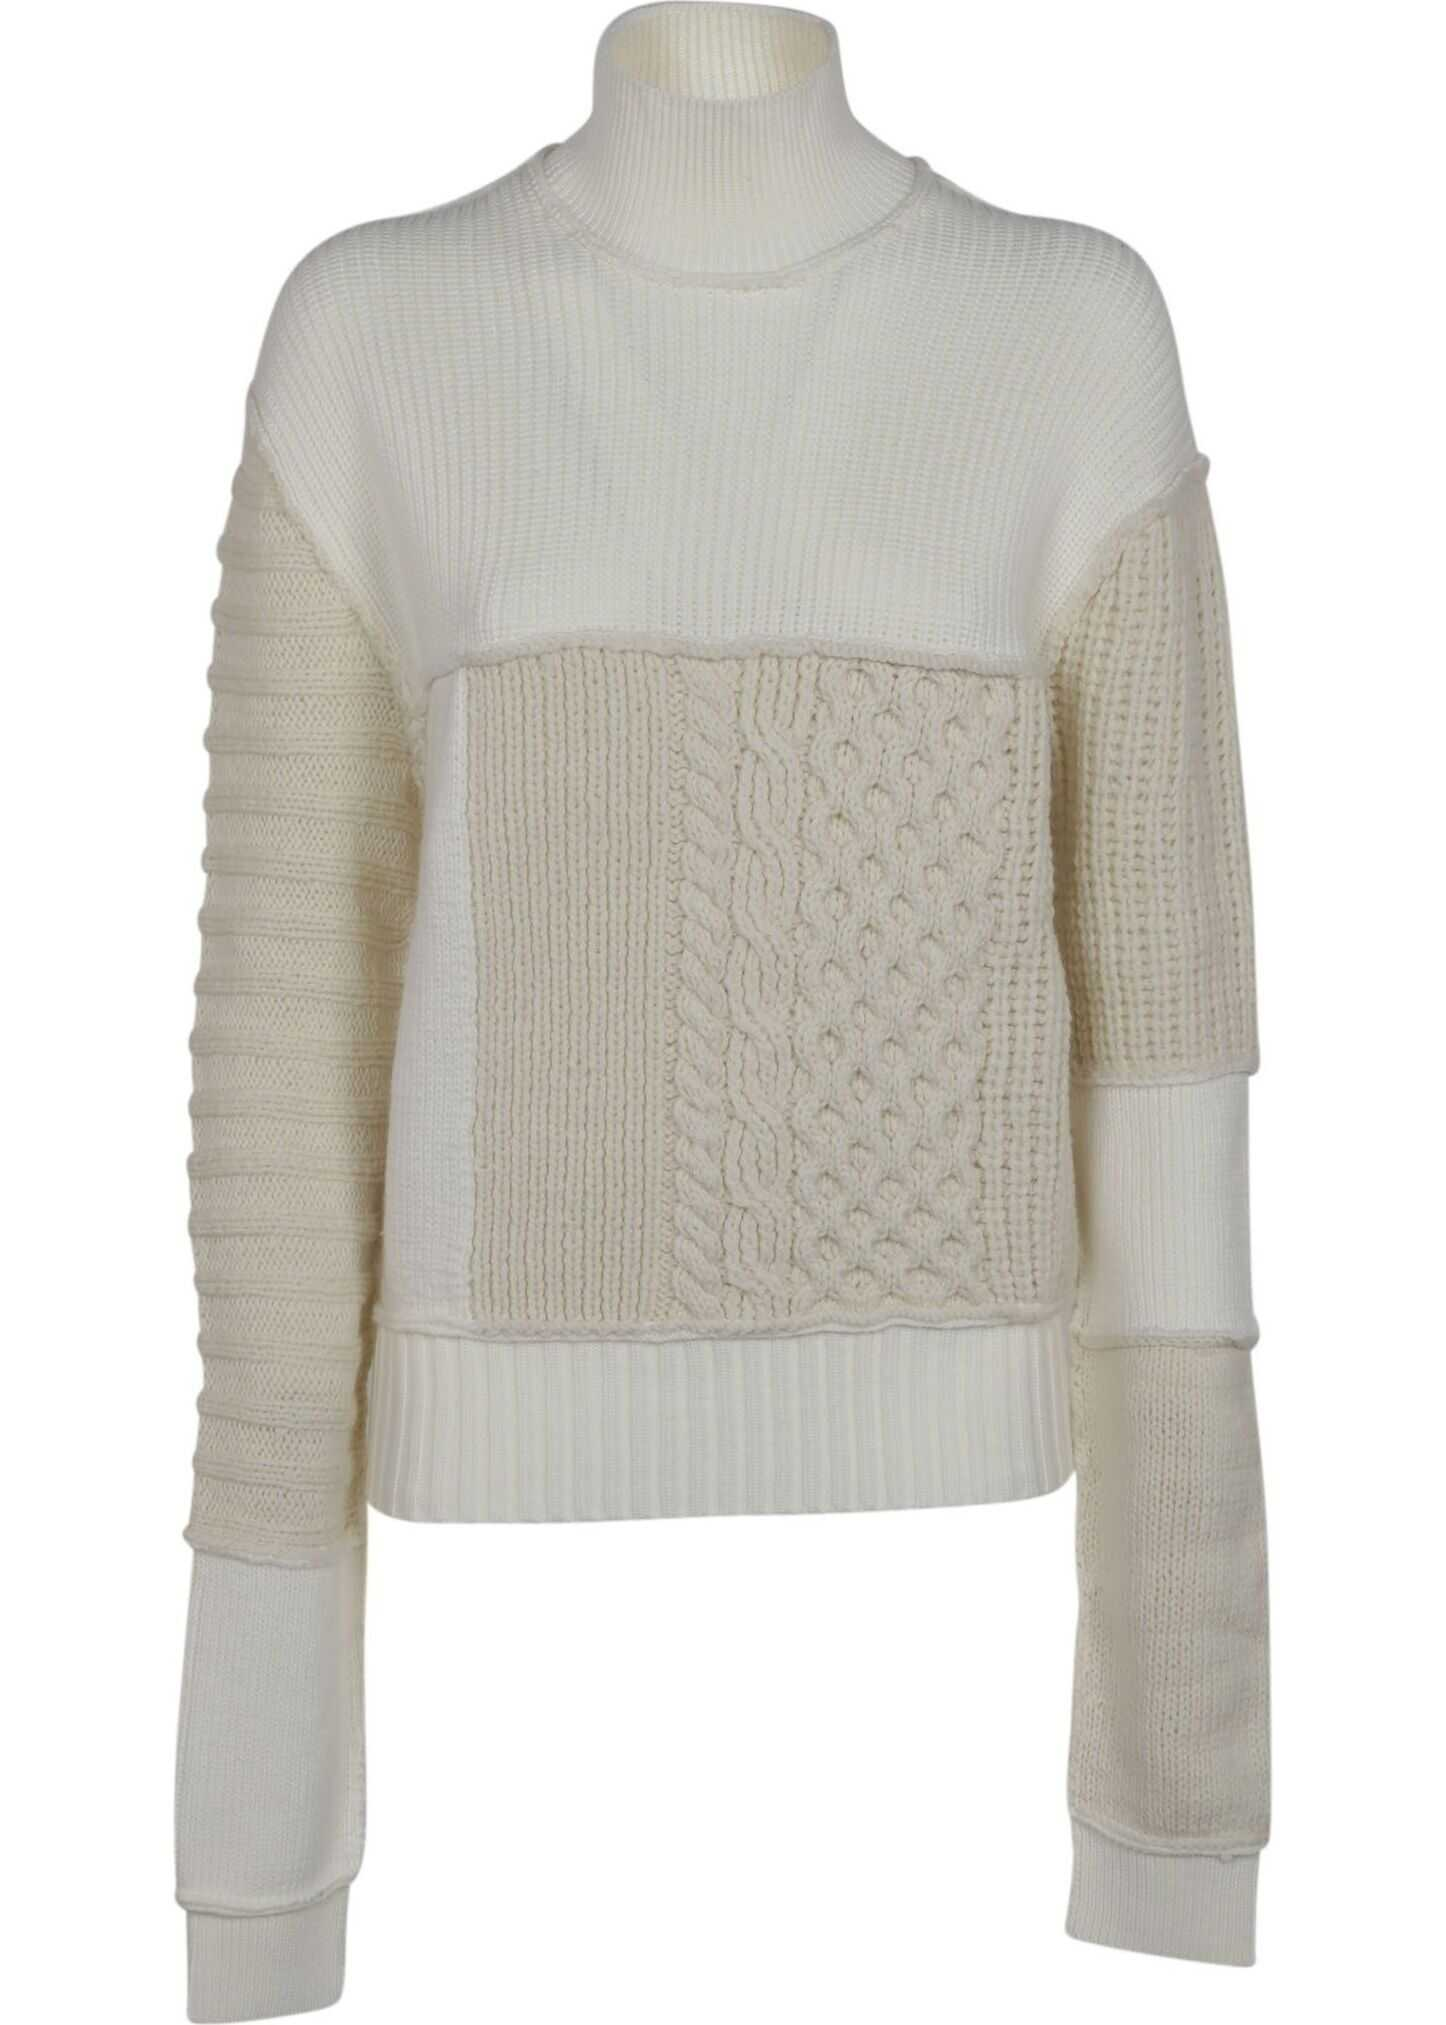 MCQ Alexander McQueen Wool Sweater WHITE